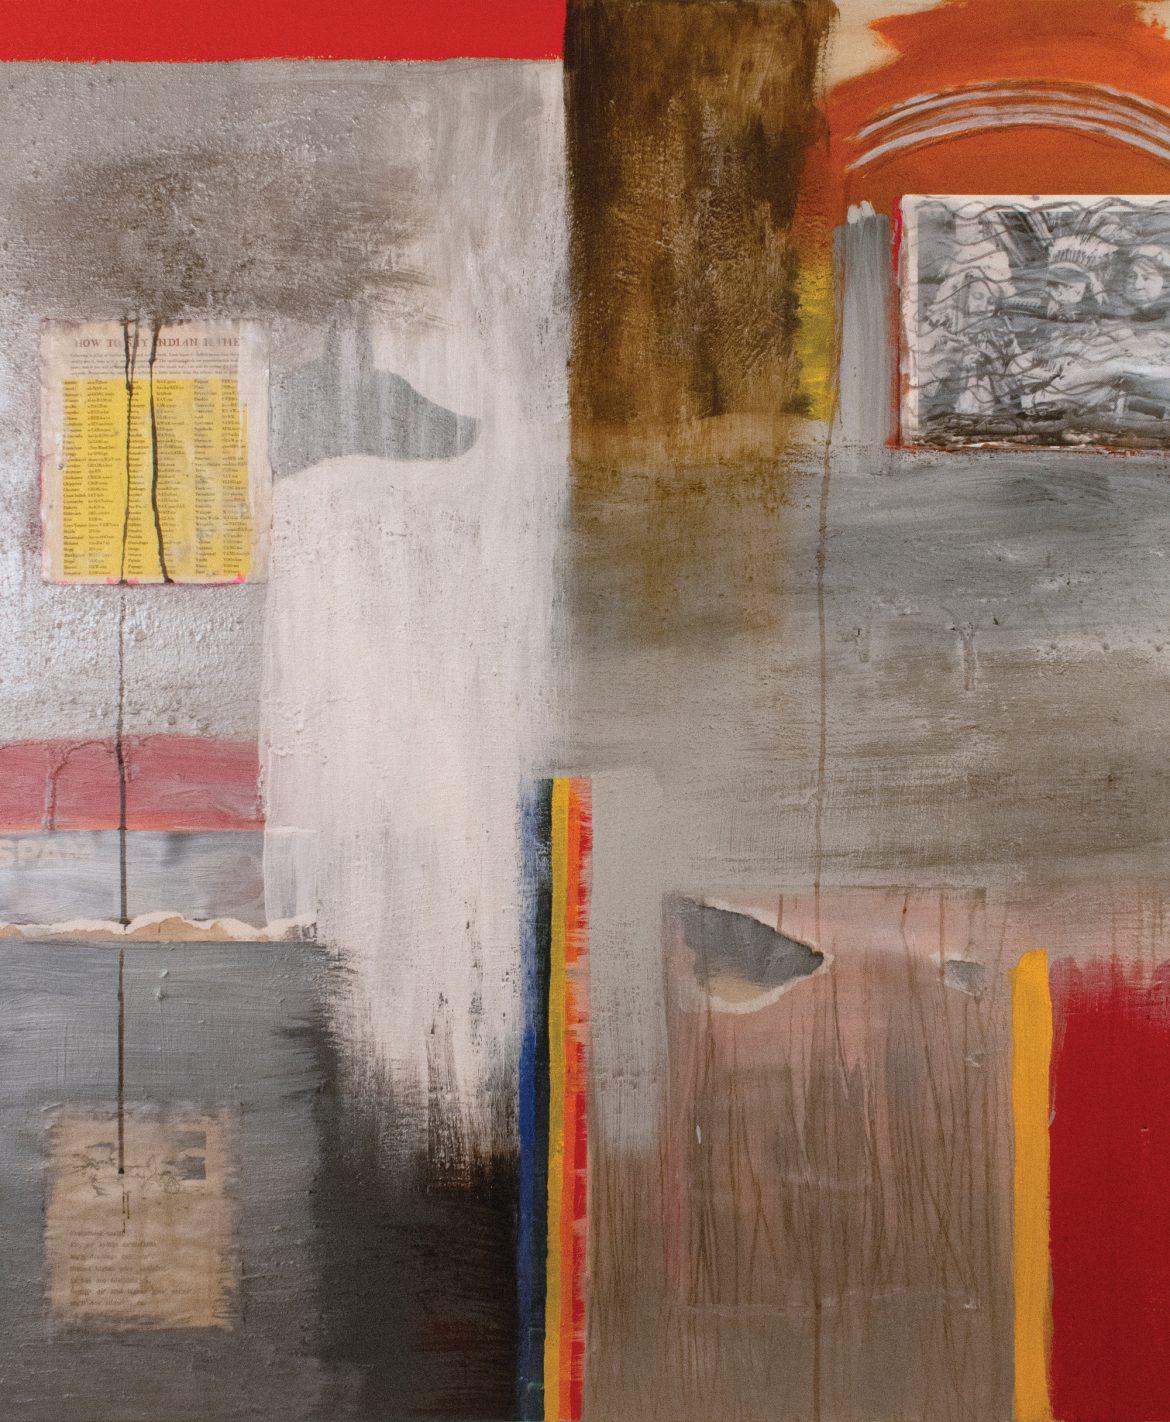 """Assimilation #4"" by John Feodorov."